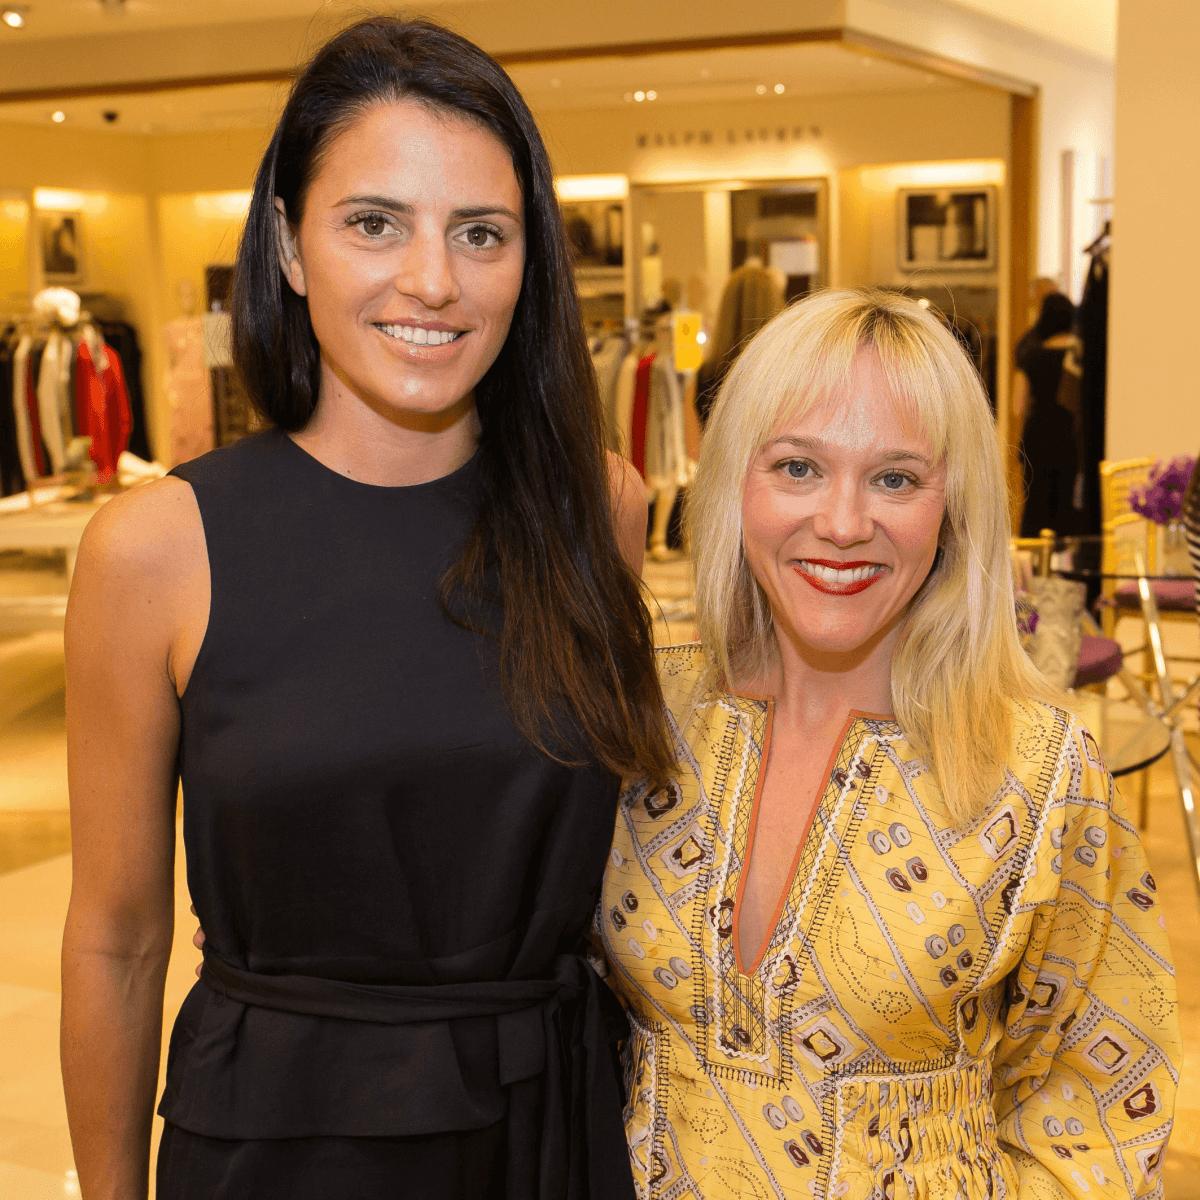 Roberto Cavalli fall fashion show DKR Fund benefit 2016 Dani Lachowikz Kristin Gish